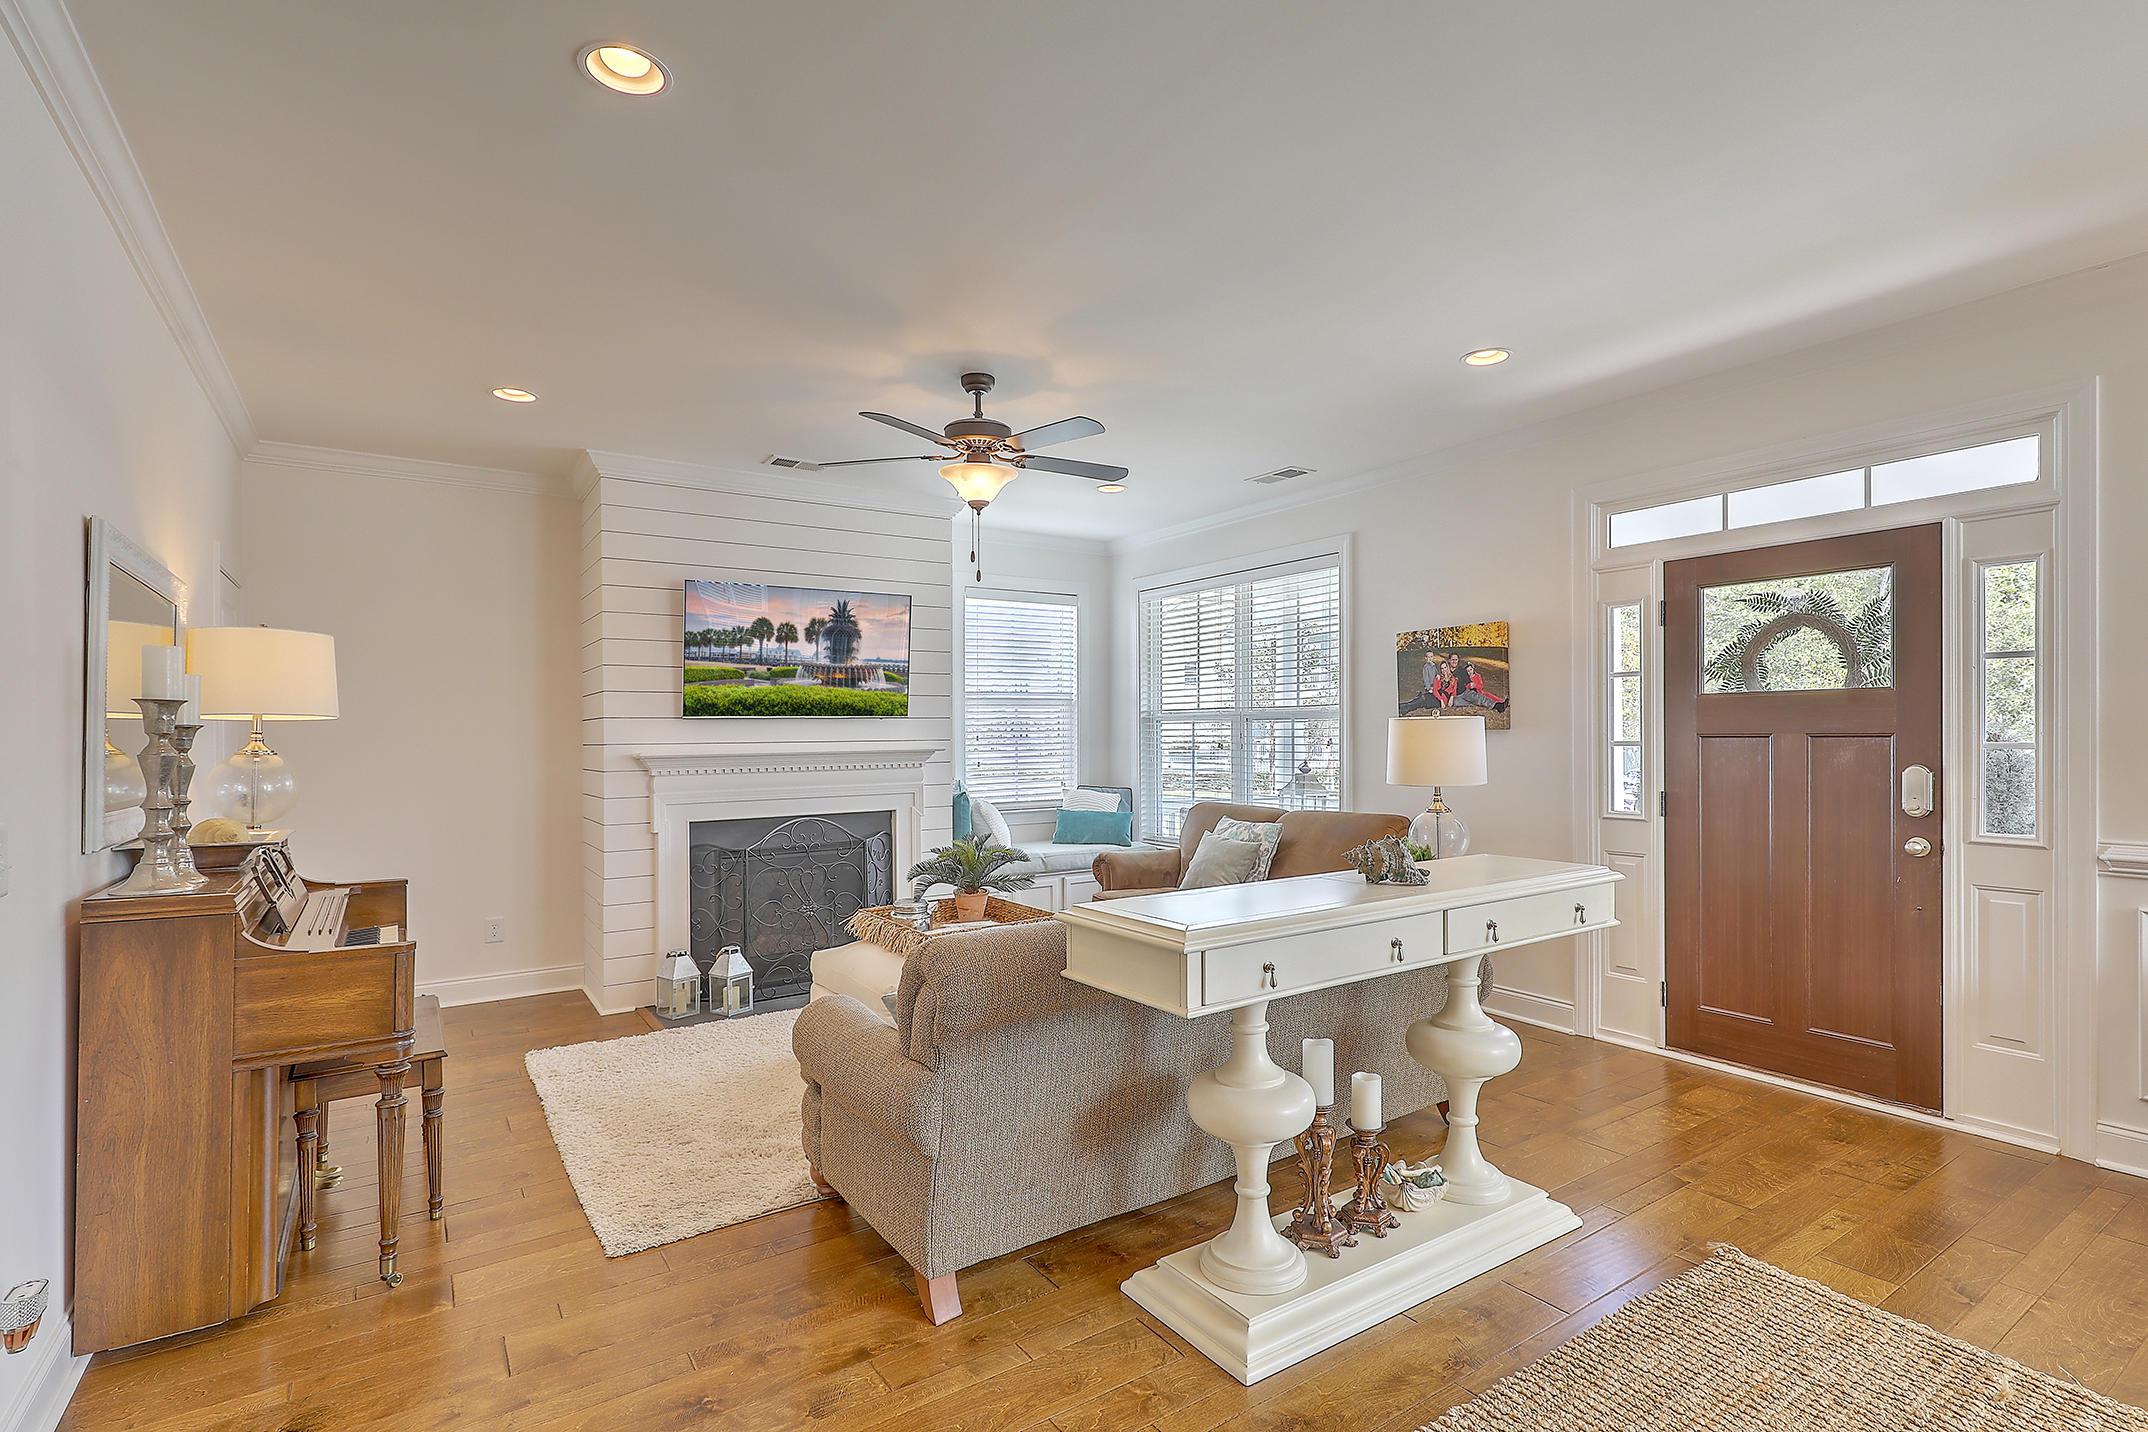 Park West Homes For Sale - 3412 Salterbeck, Mount Pleasant, SC - 3